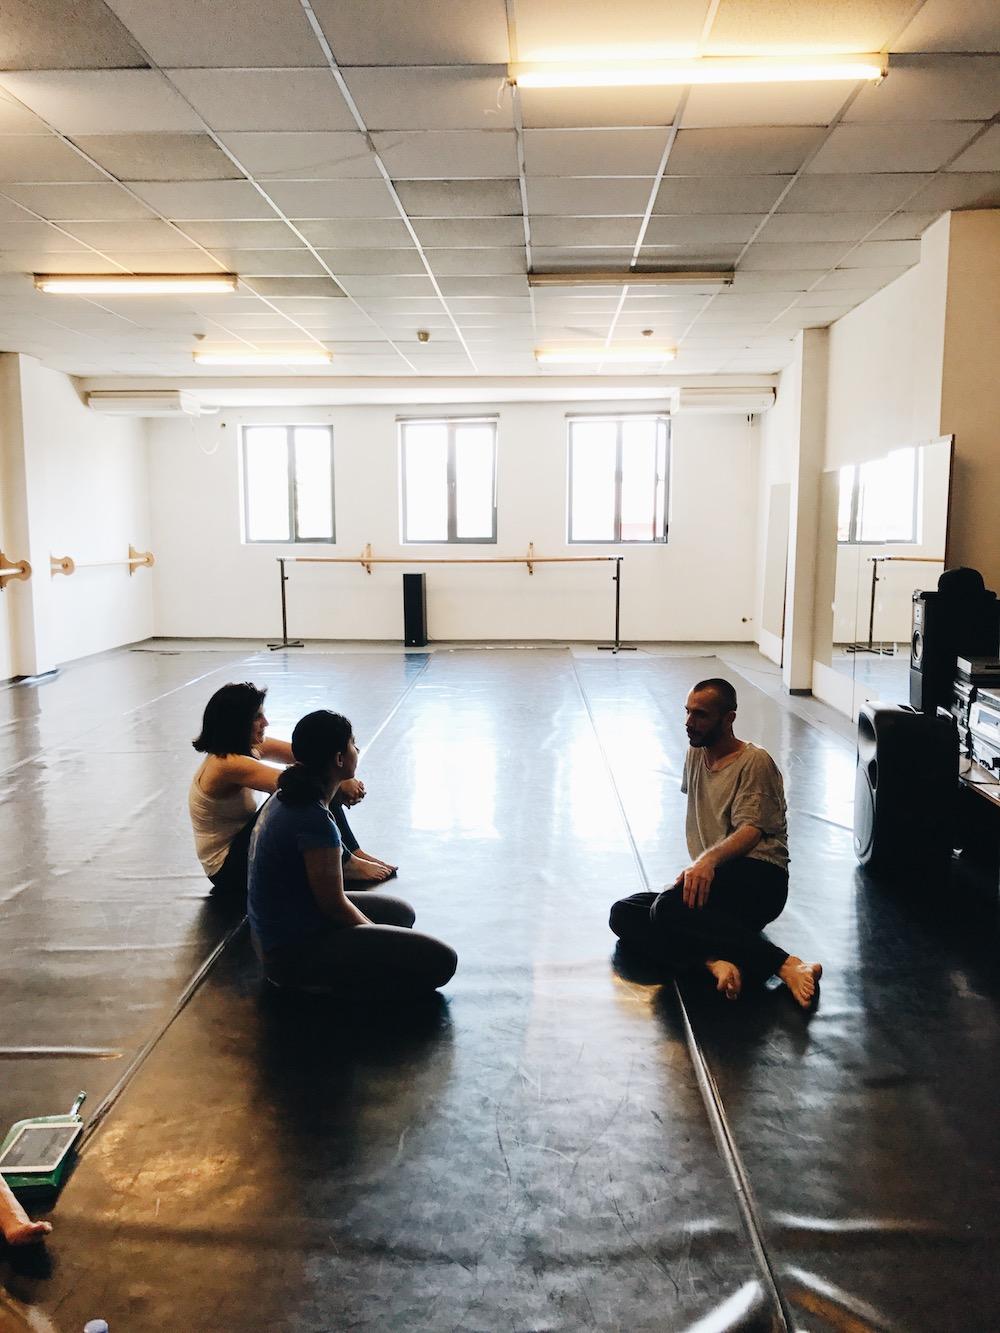 Antistatic Dance Workshops, Sofia, Bulgaria | Travel by Ruby Josephine